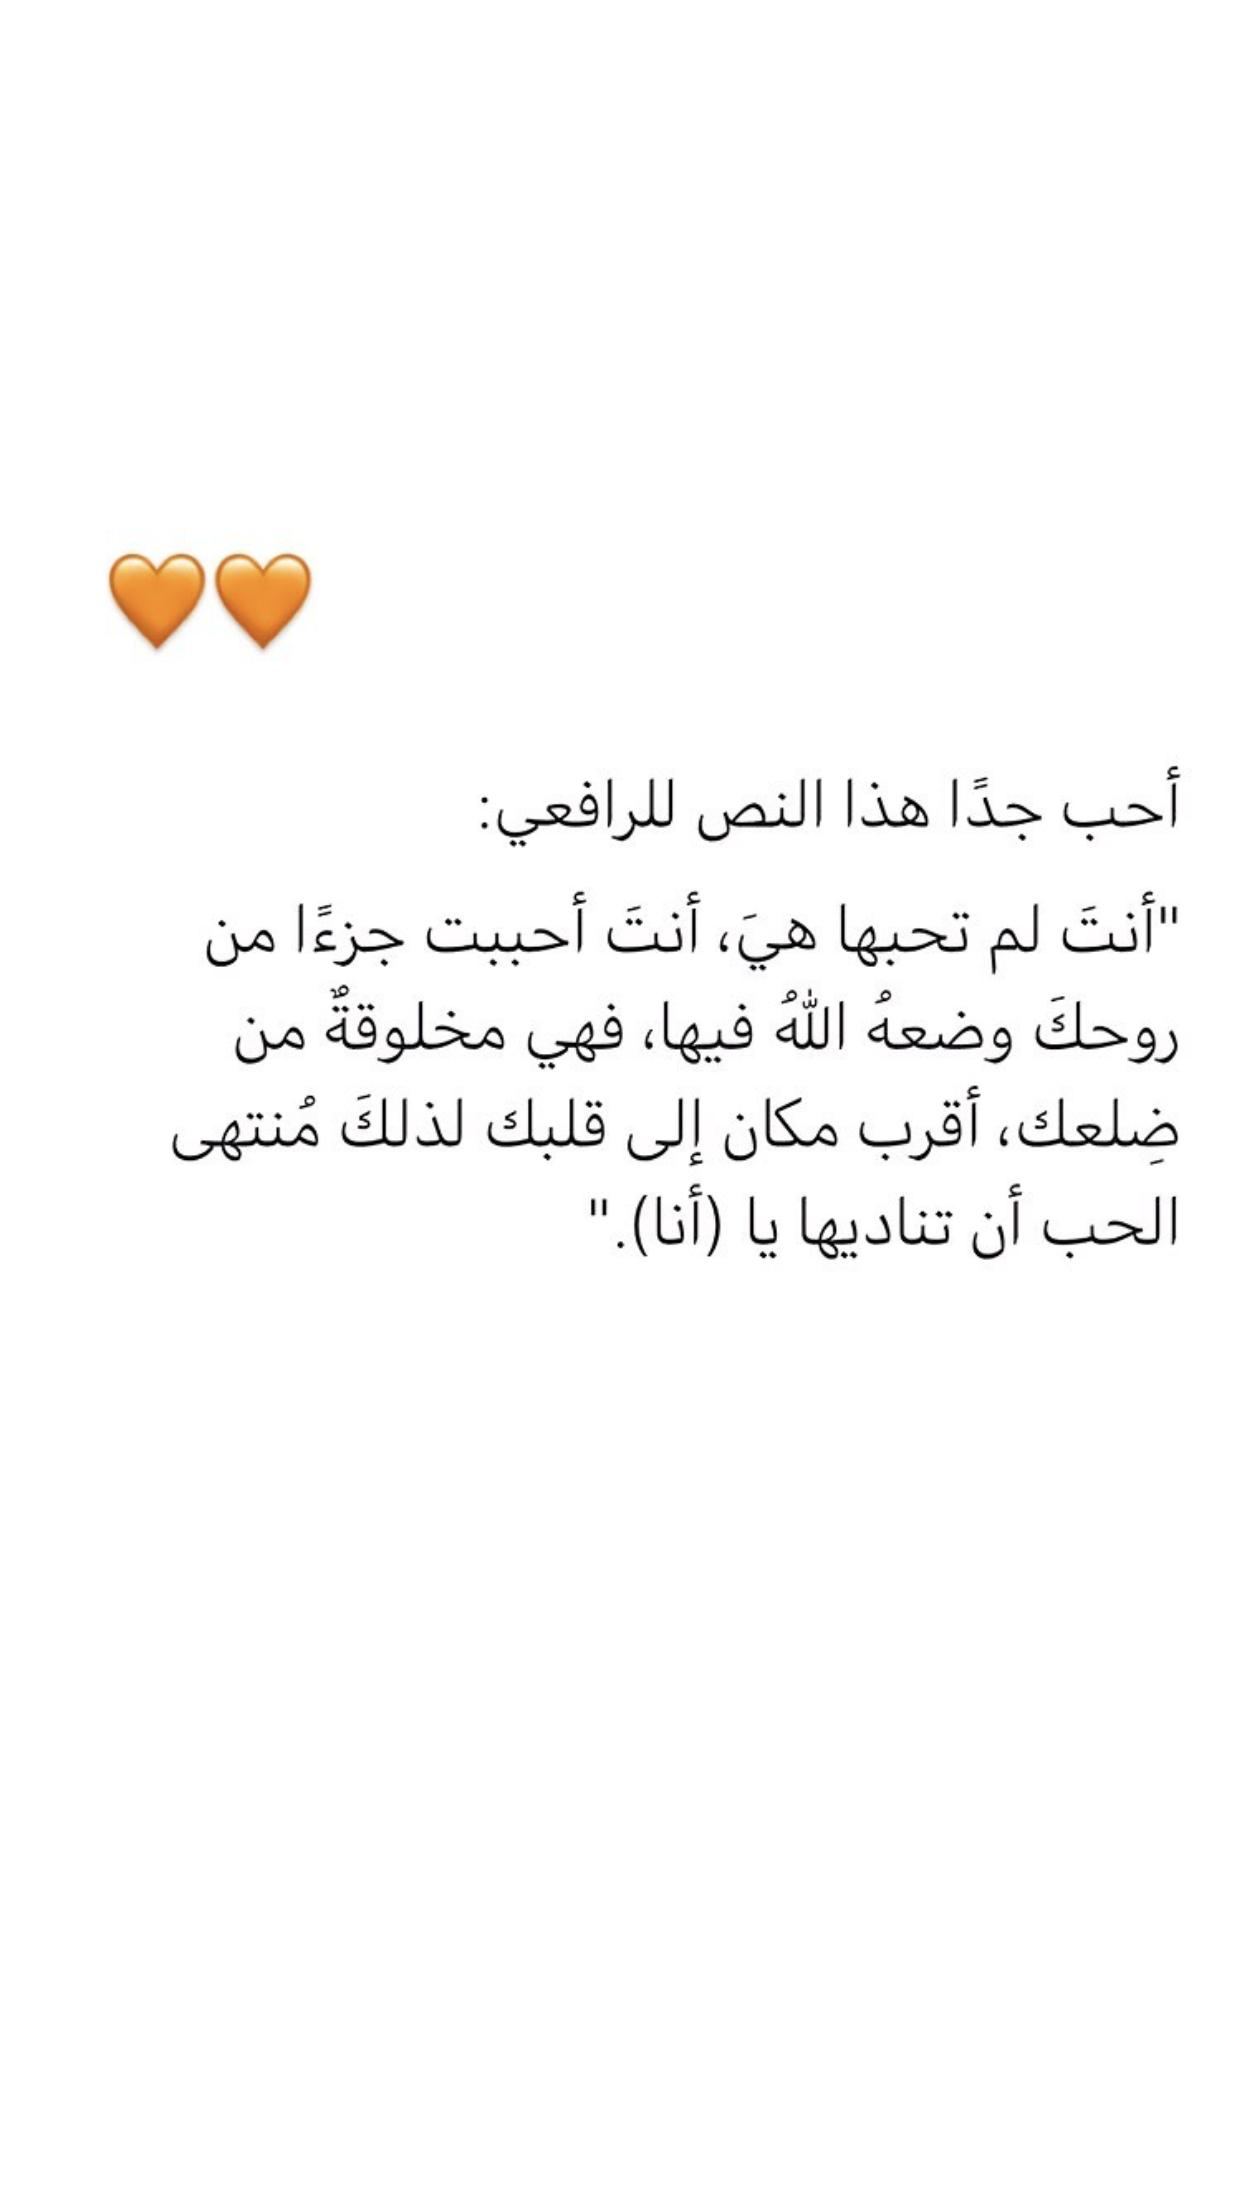 Pin By Asmaa Anwar On بالعربي10 Romantic Quotes For Him Romantic Quotes Quotes For Him